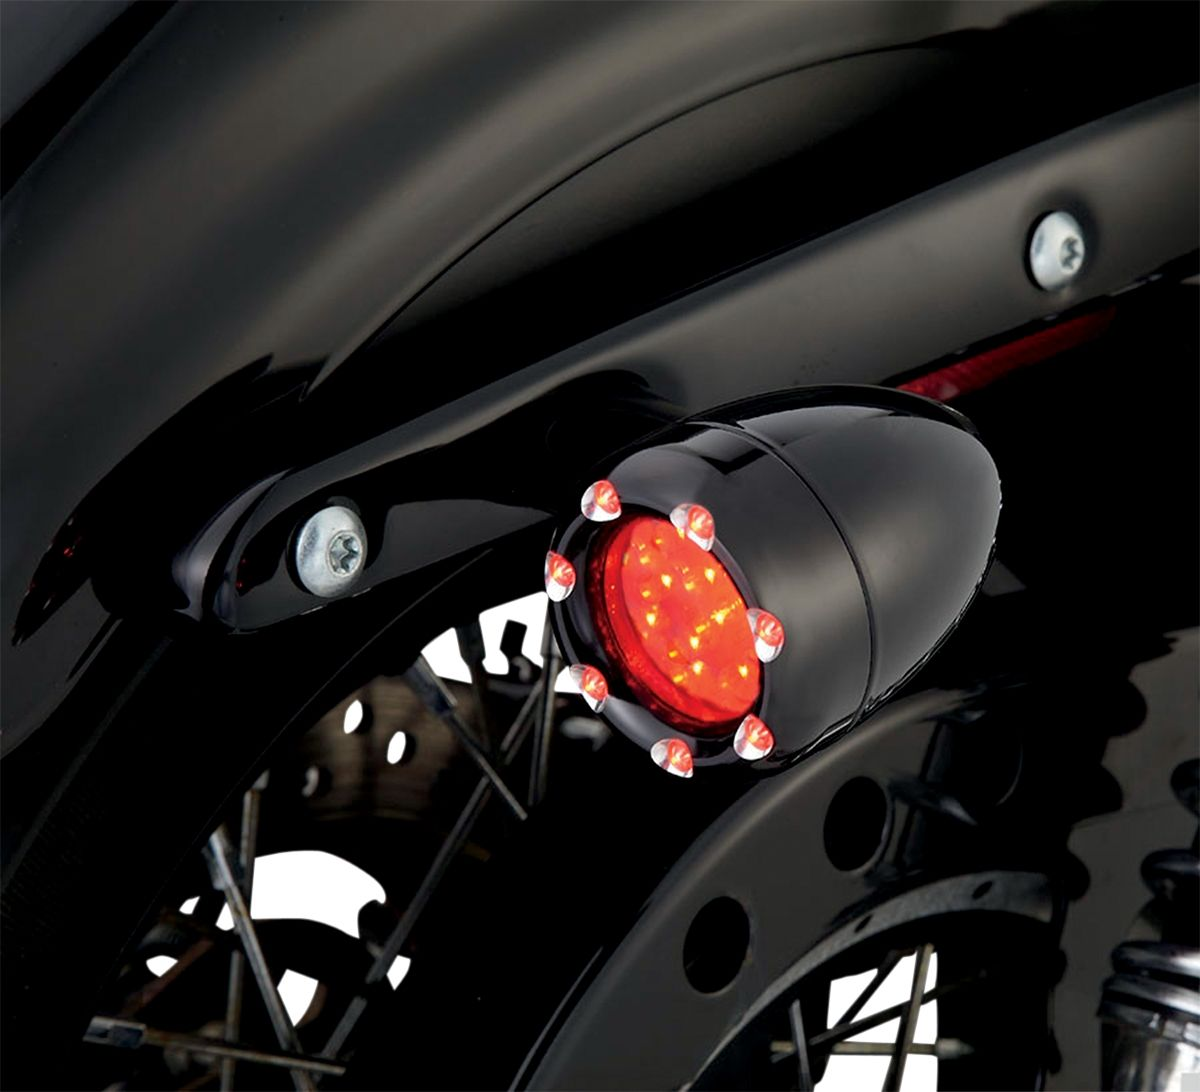 【ARLEN NESS】LED 方向燈 BLK RD S [2040-0852] - 「Webike-摩托百貨」